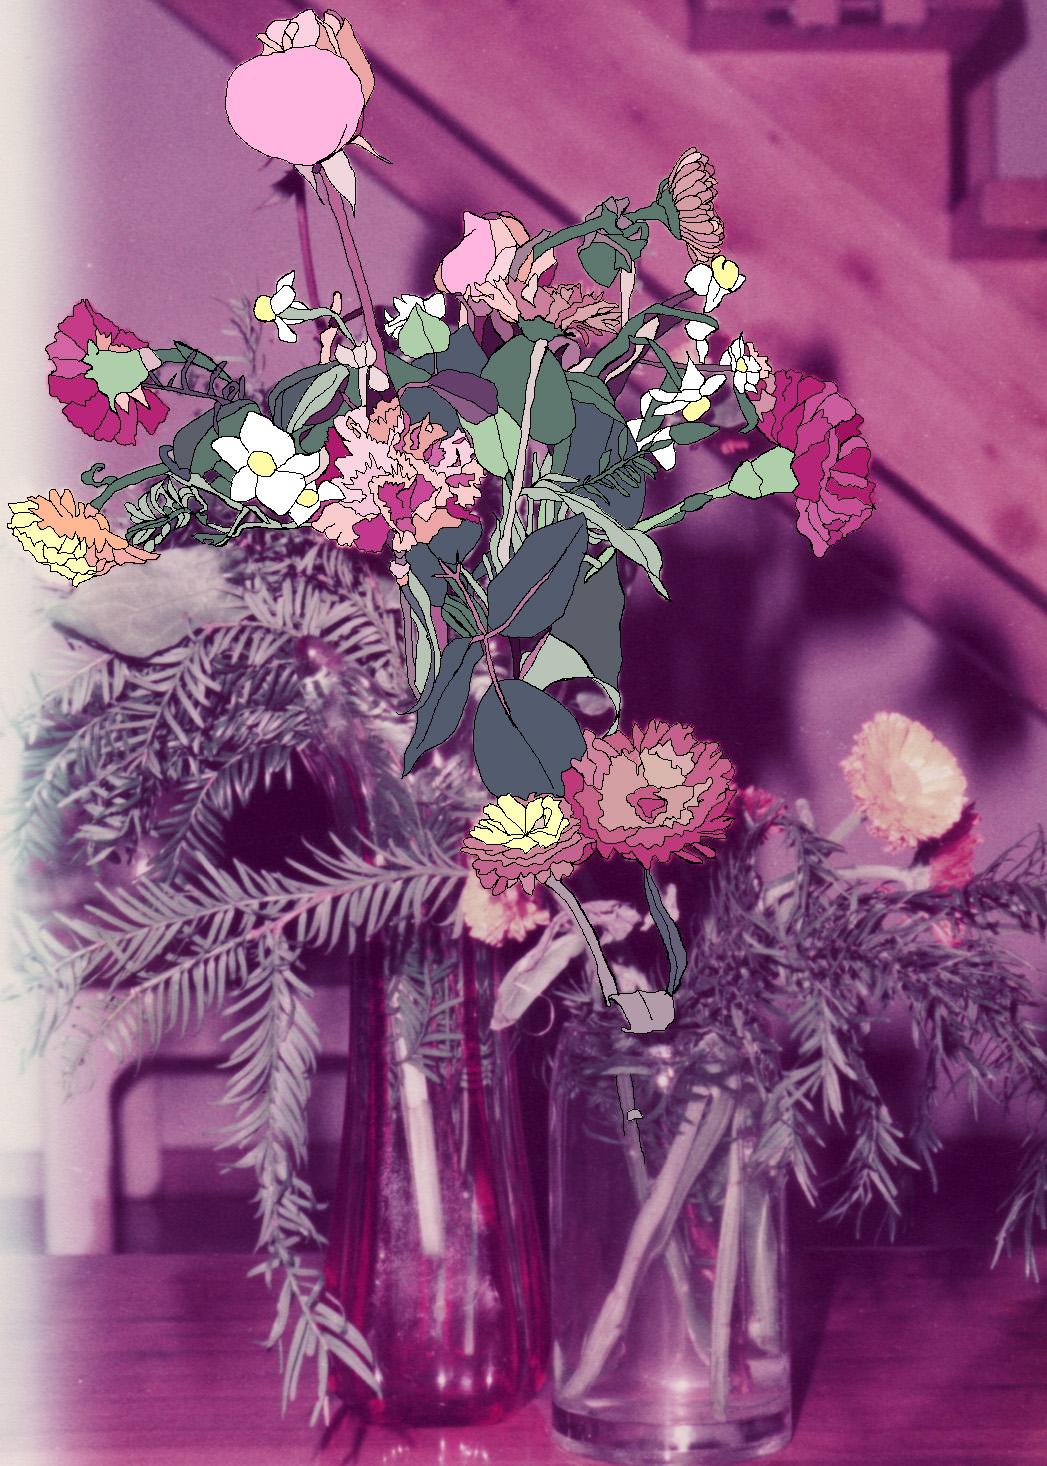 "Flowers, Archival ink print, framed, 60 x 45 cm, 2010. Edition 3 + 1AP                                 Normal    0                false    false    false       EN-US    JA    X-NONE                                                                                                                                                                                                                                                                                                                                                                                                                                                                                                                                                  /* Style Definitions */ table.MsoNormalTable {mso-style-name:""Table Normal""; mso-tstyle-rowband-size:0; mso-tstyle-colband-size:0; mso-style-noshow:yes; mso-style-priority:99; mso-style-parent:""""; mso-padding-alt:0in 5.4pt 0in 5.4pt; mso-para-margin:0in; mso-para-margin-bottom:.0001pt; mso-pagination:widow-orphan; font-size:12.0pt; font-family:Cambria; mso-ascii-font-family:Cambria; mso-ascii-theme-font:minor-latin; mso-hansi-font-family:Cambria; mso-hansi-theme-font:minor-latin; mso-ansi-language:EN-US;}"